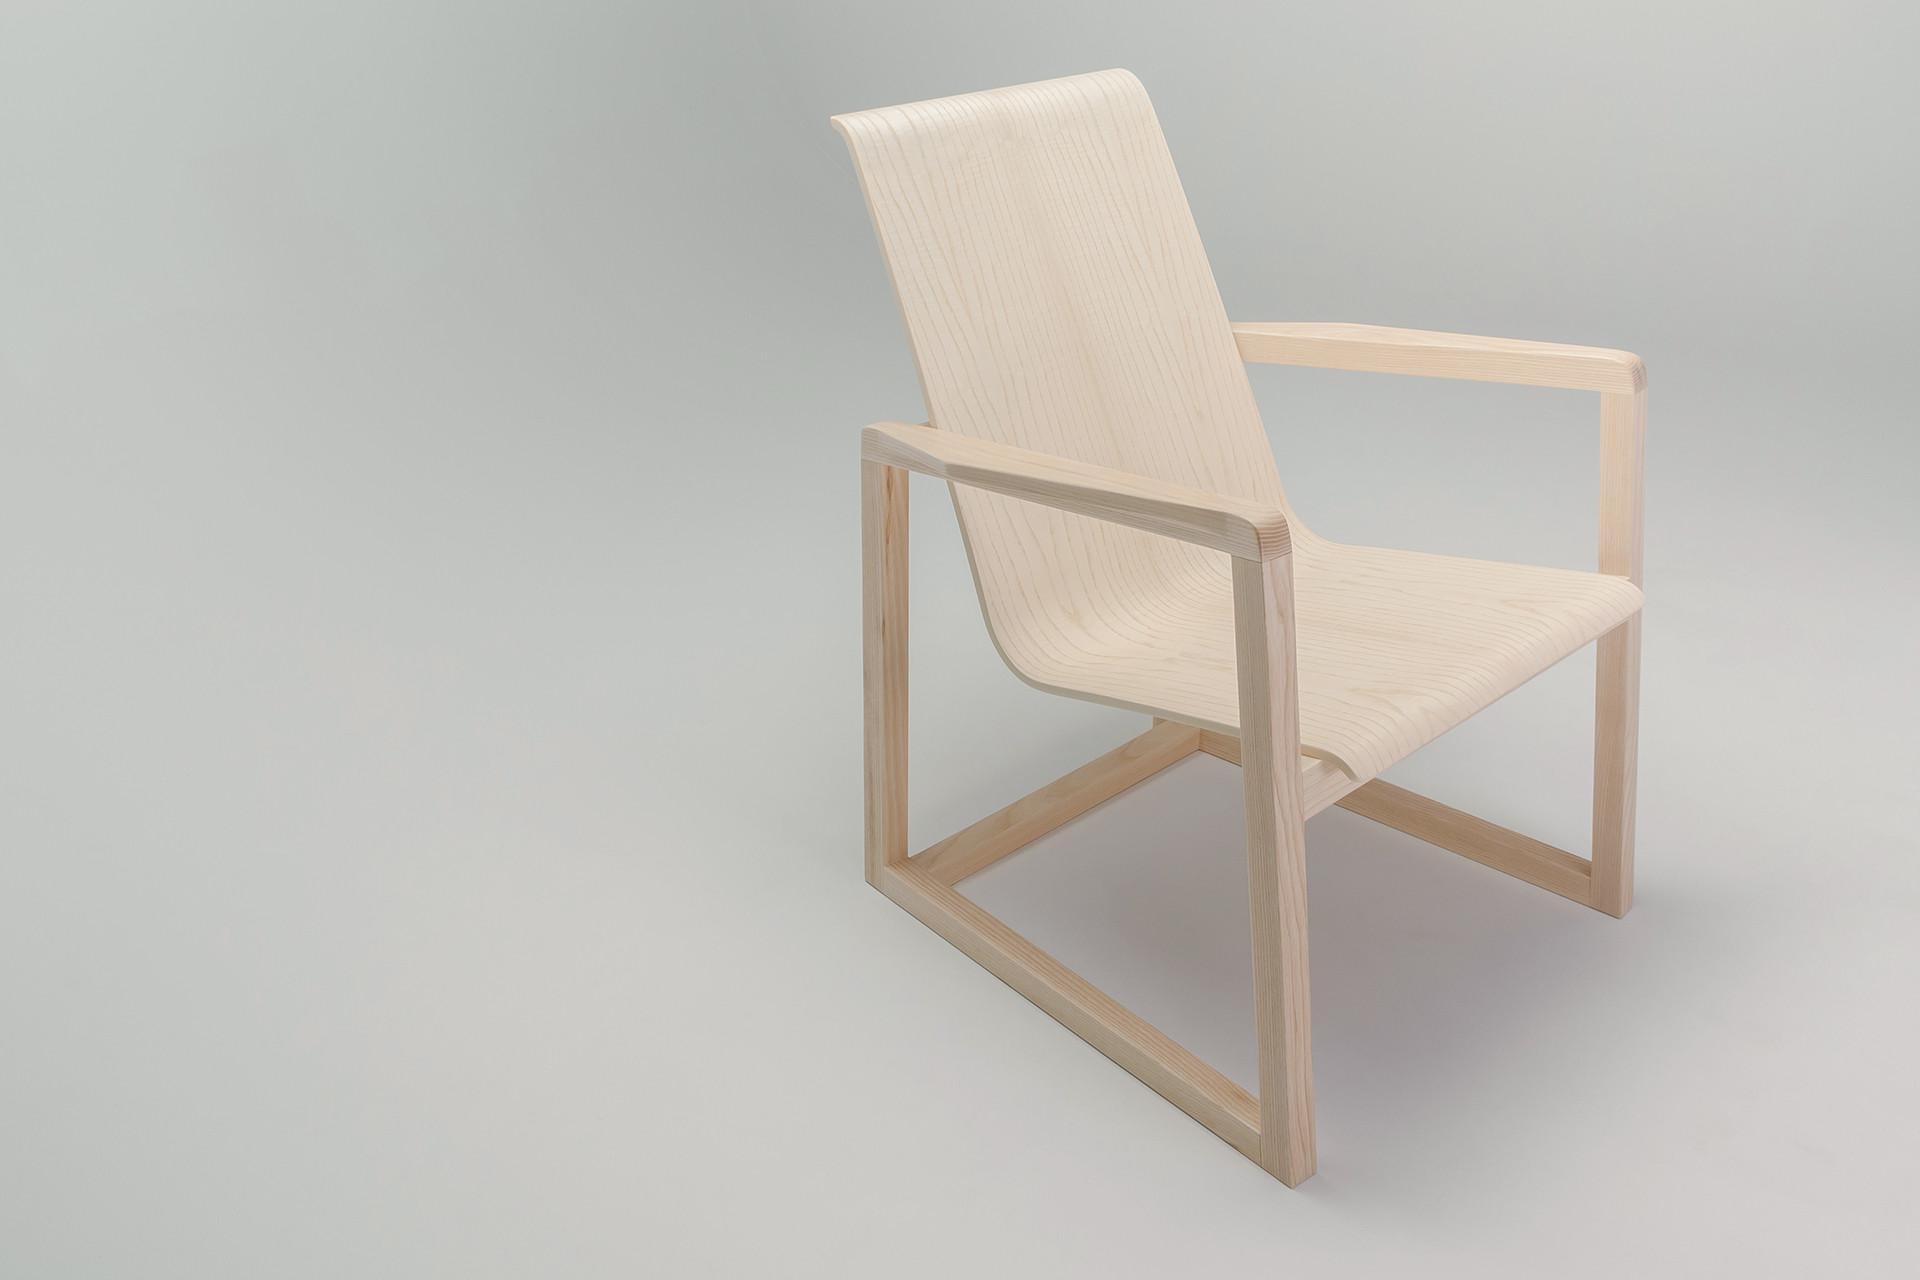 Serene-Easy-Chair_5_1920x1280_72dpi.jpg